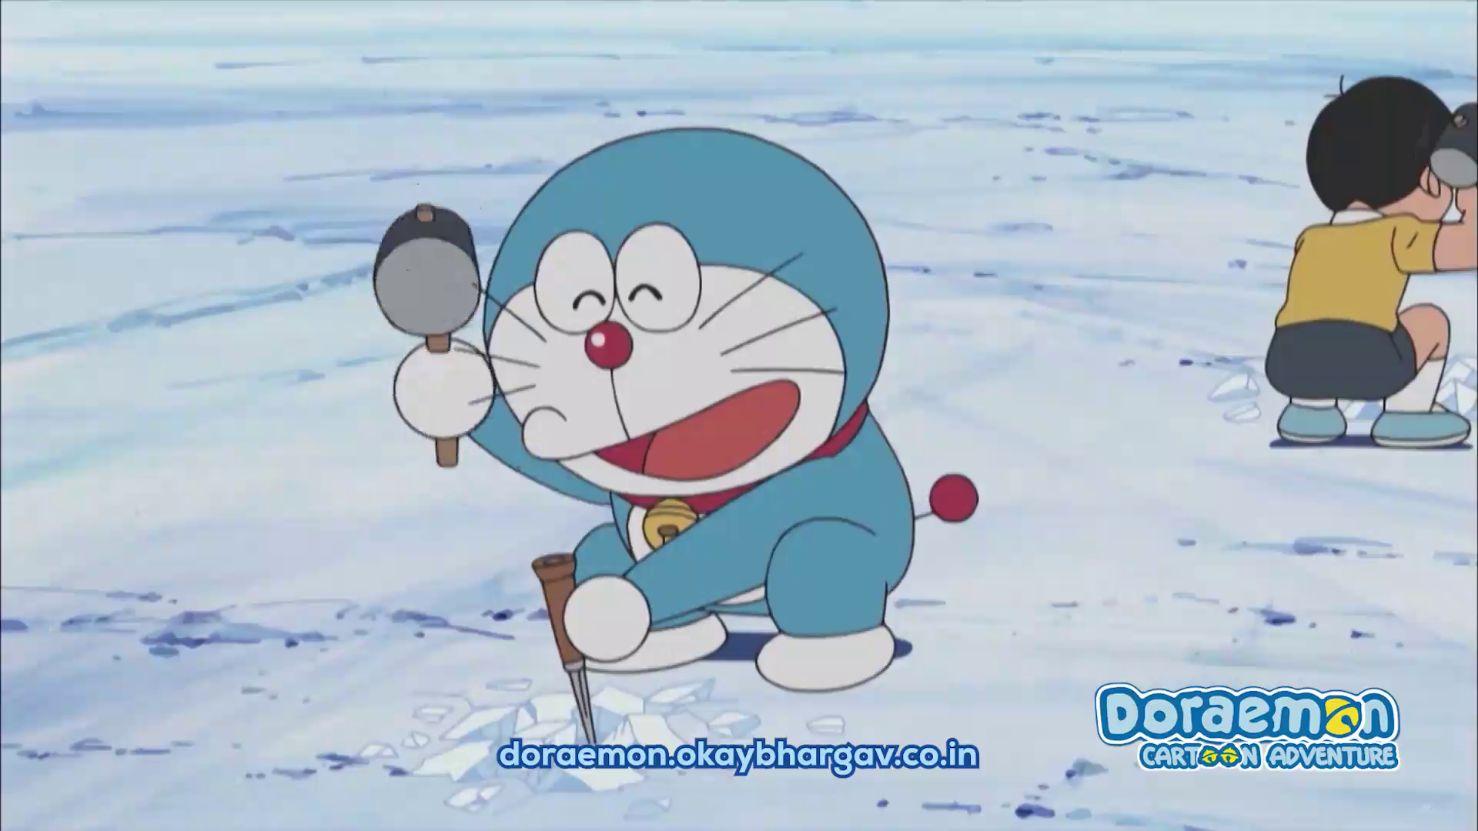 Doraemon Episode 6-Transform, Transform, and Transform Again | The Little House on the Big Ice Mountain Season 16